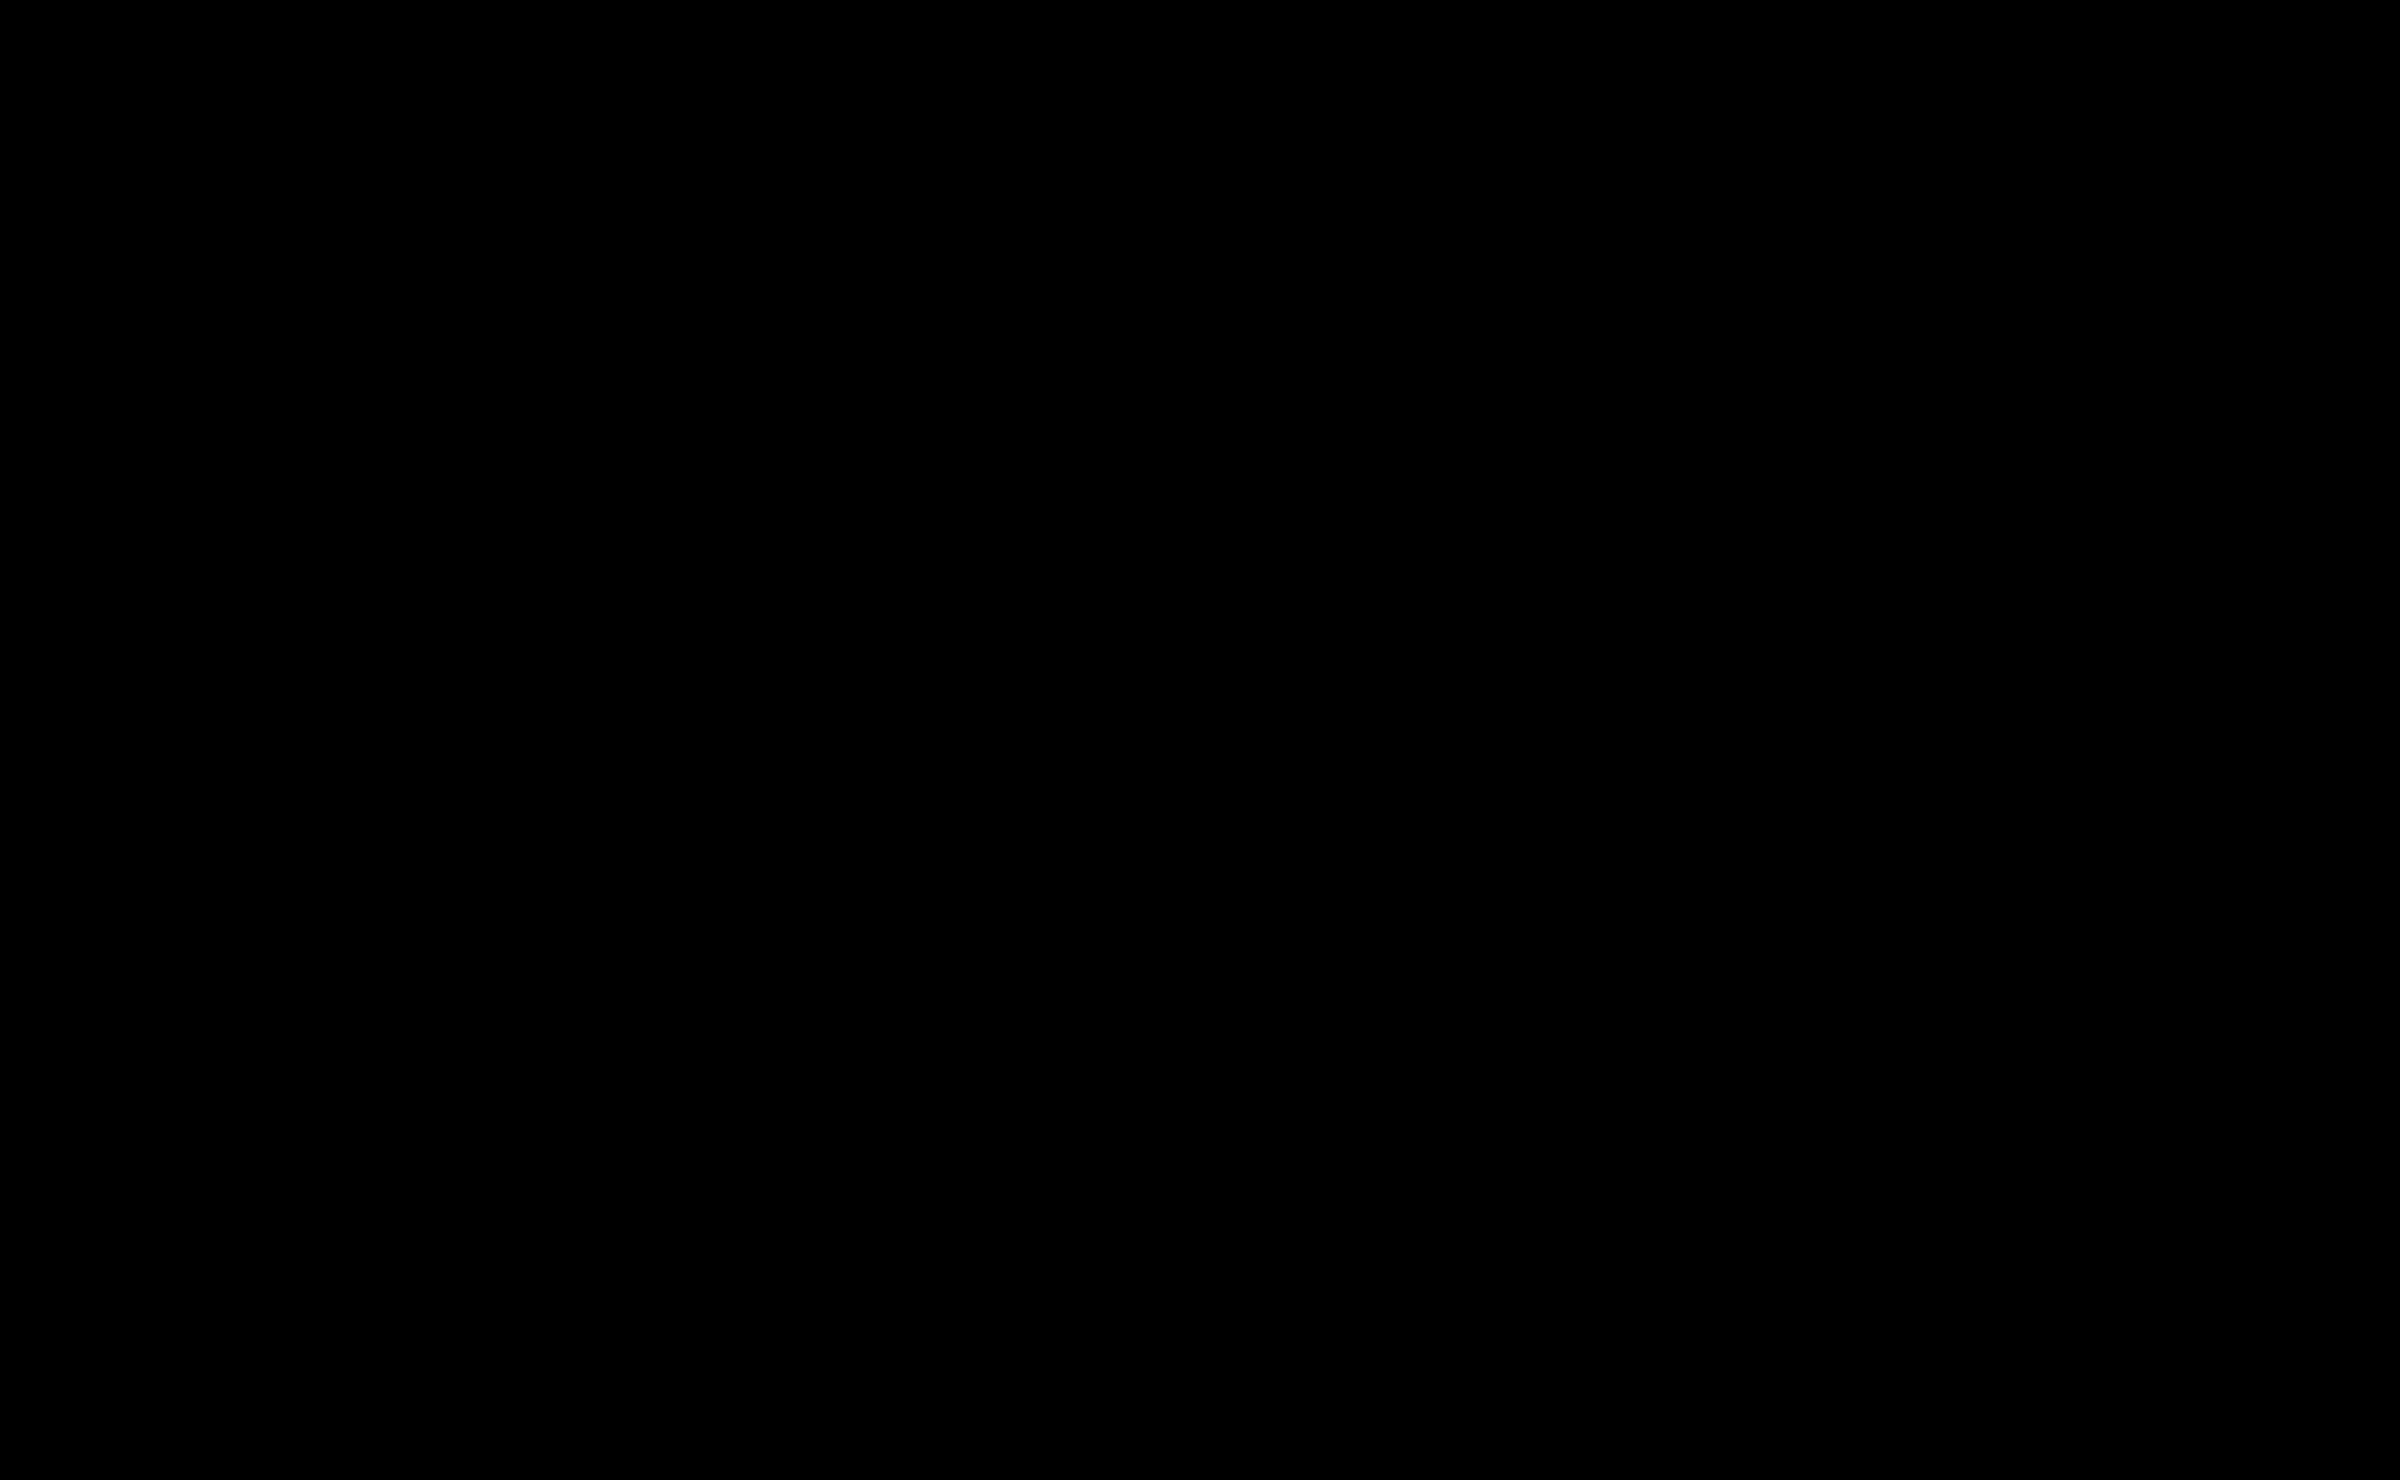 Gun PNG Black And White - 65220